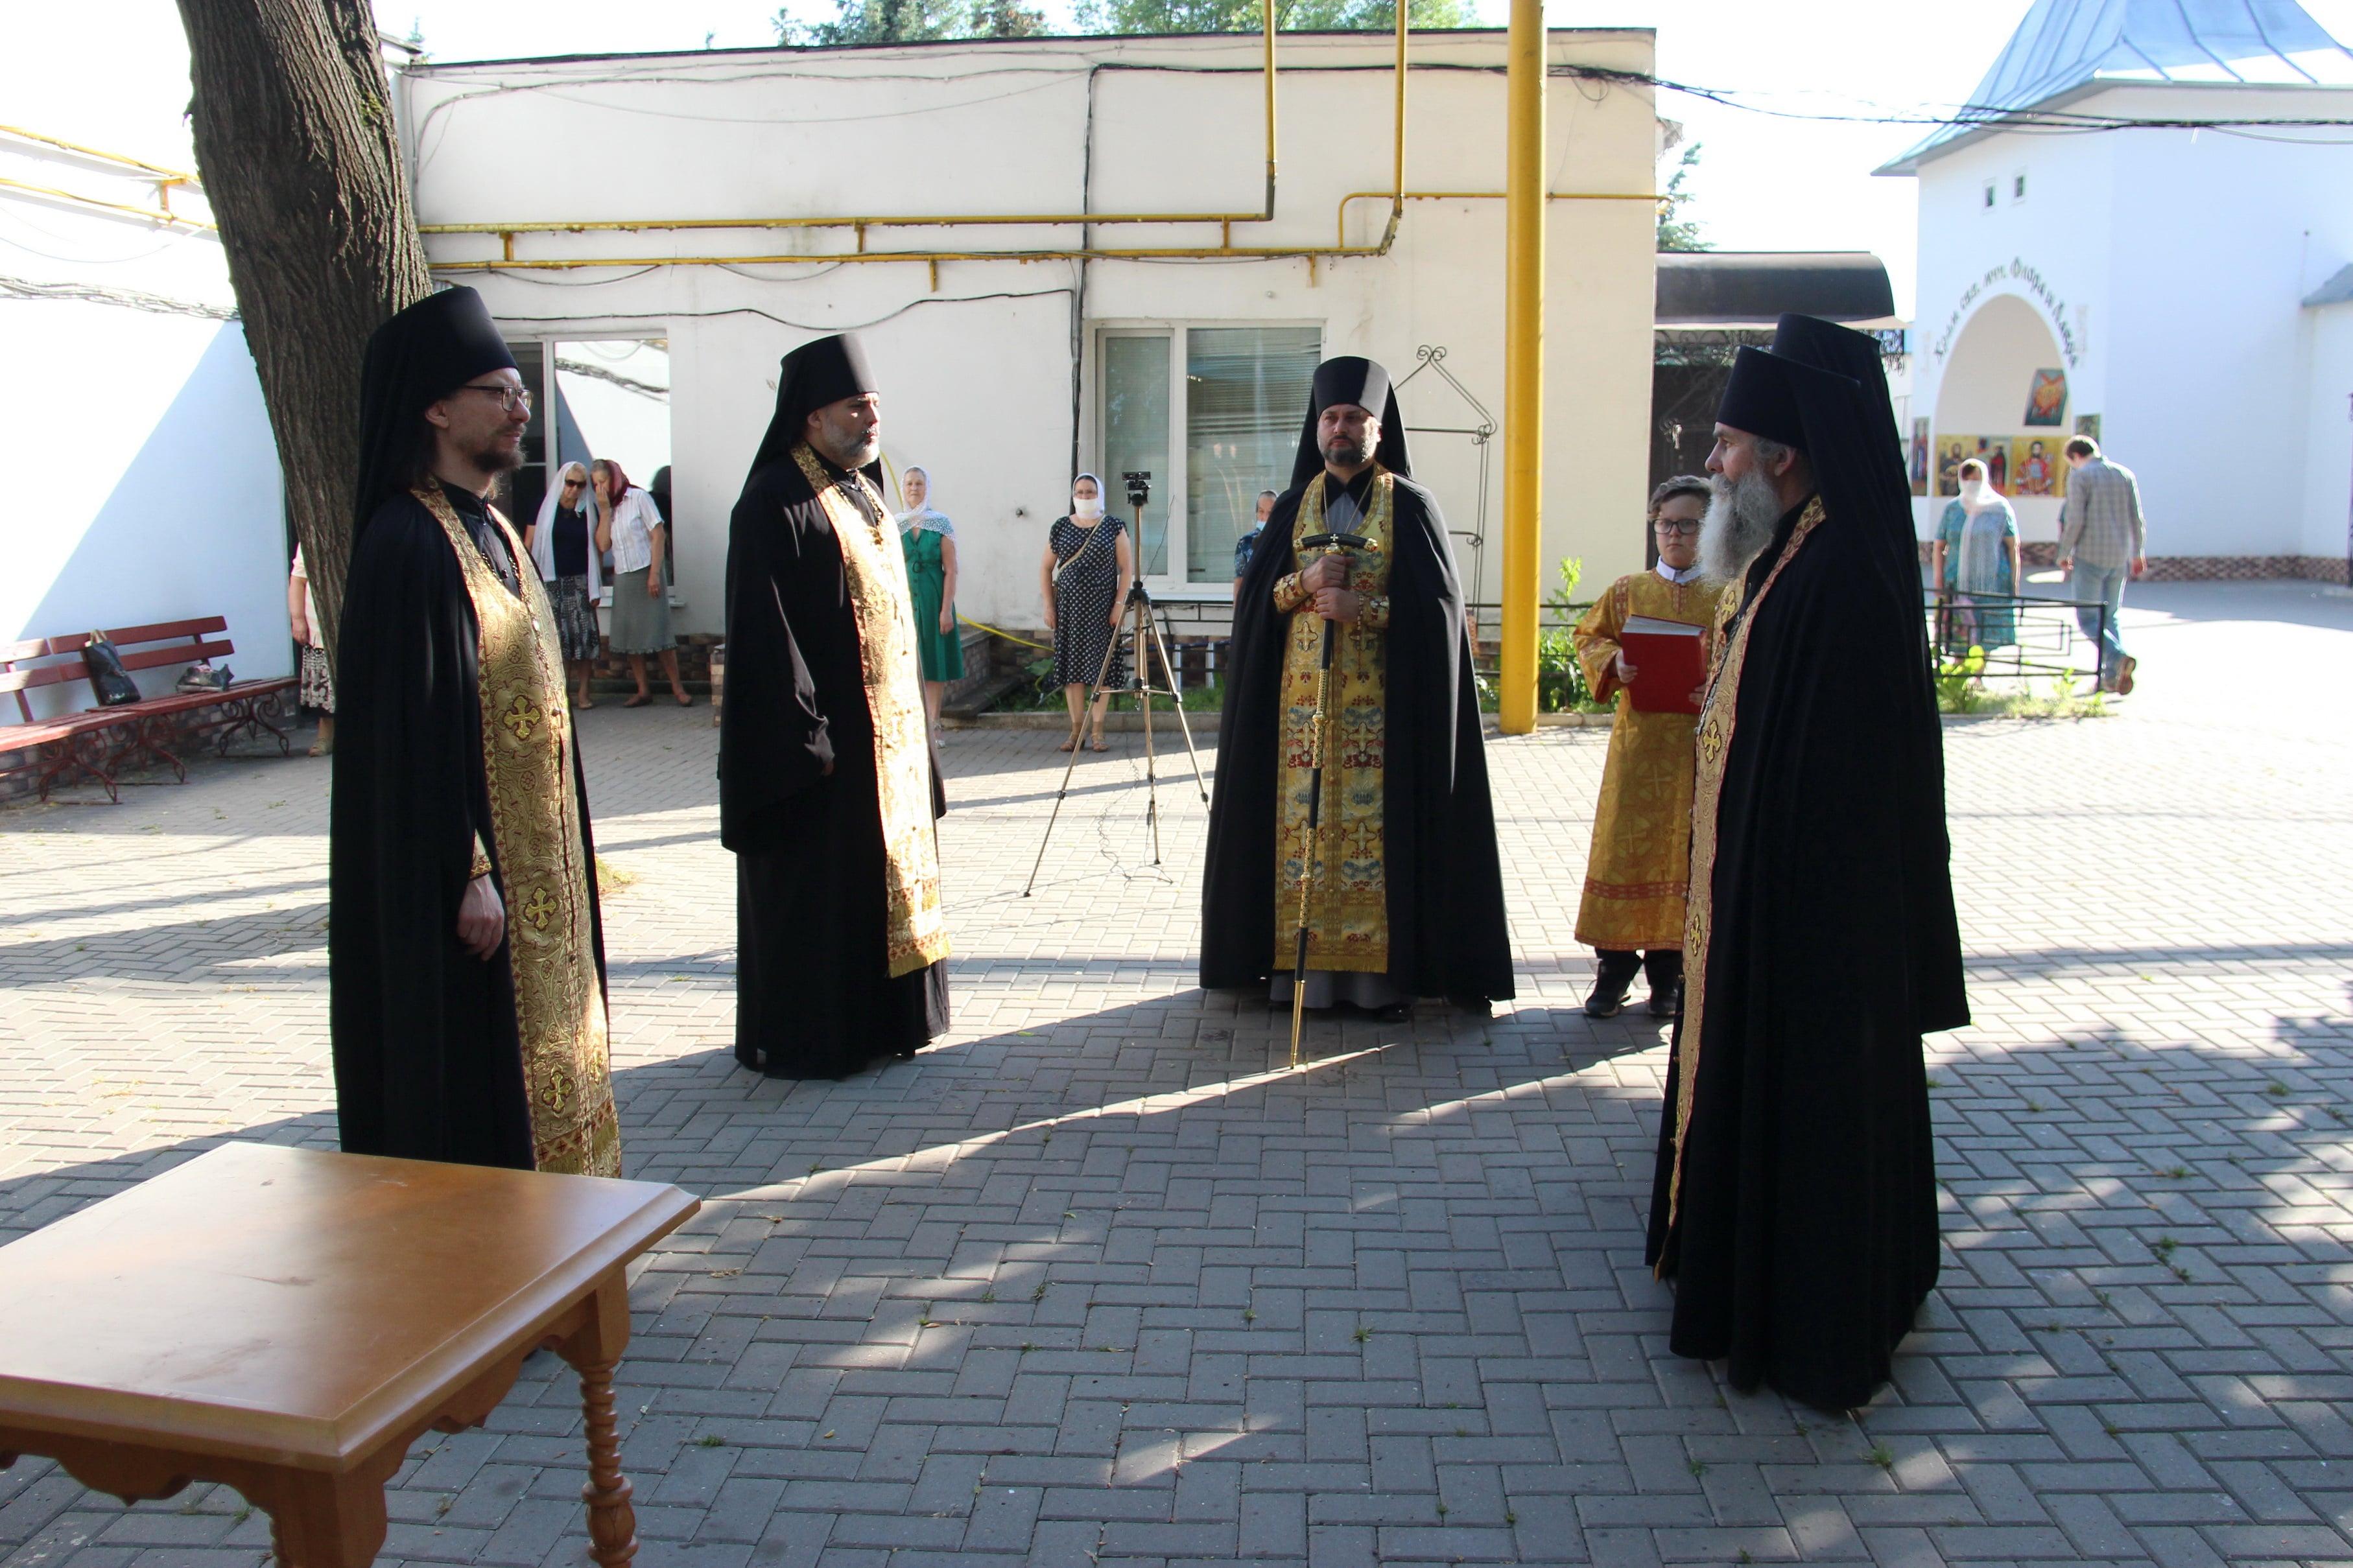 http://monuspen.ru/photoreports/767755fb4521ea66ecbf1338743fc8dg.JPG